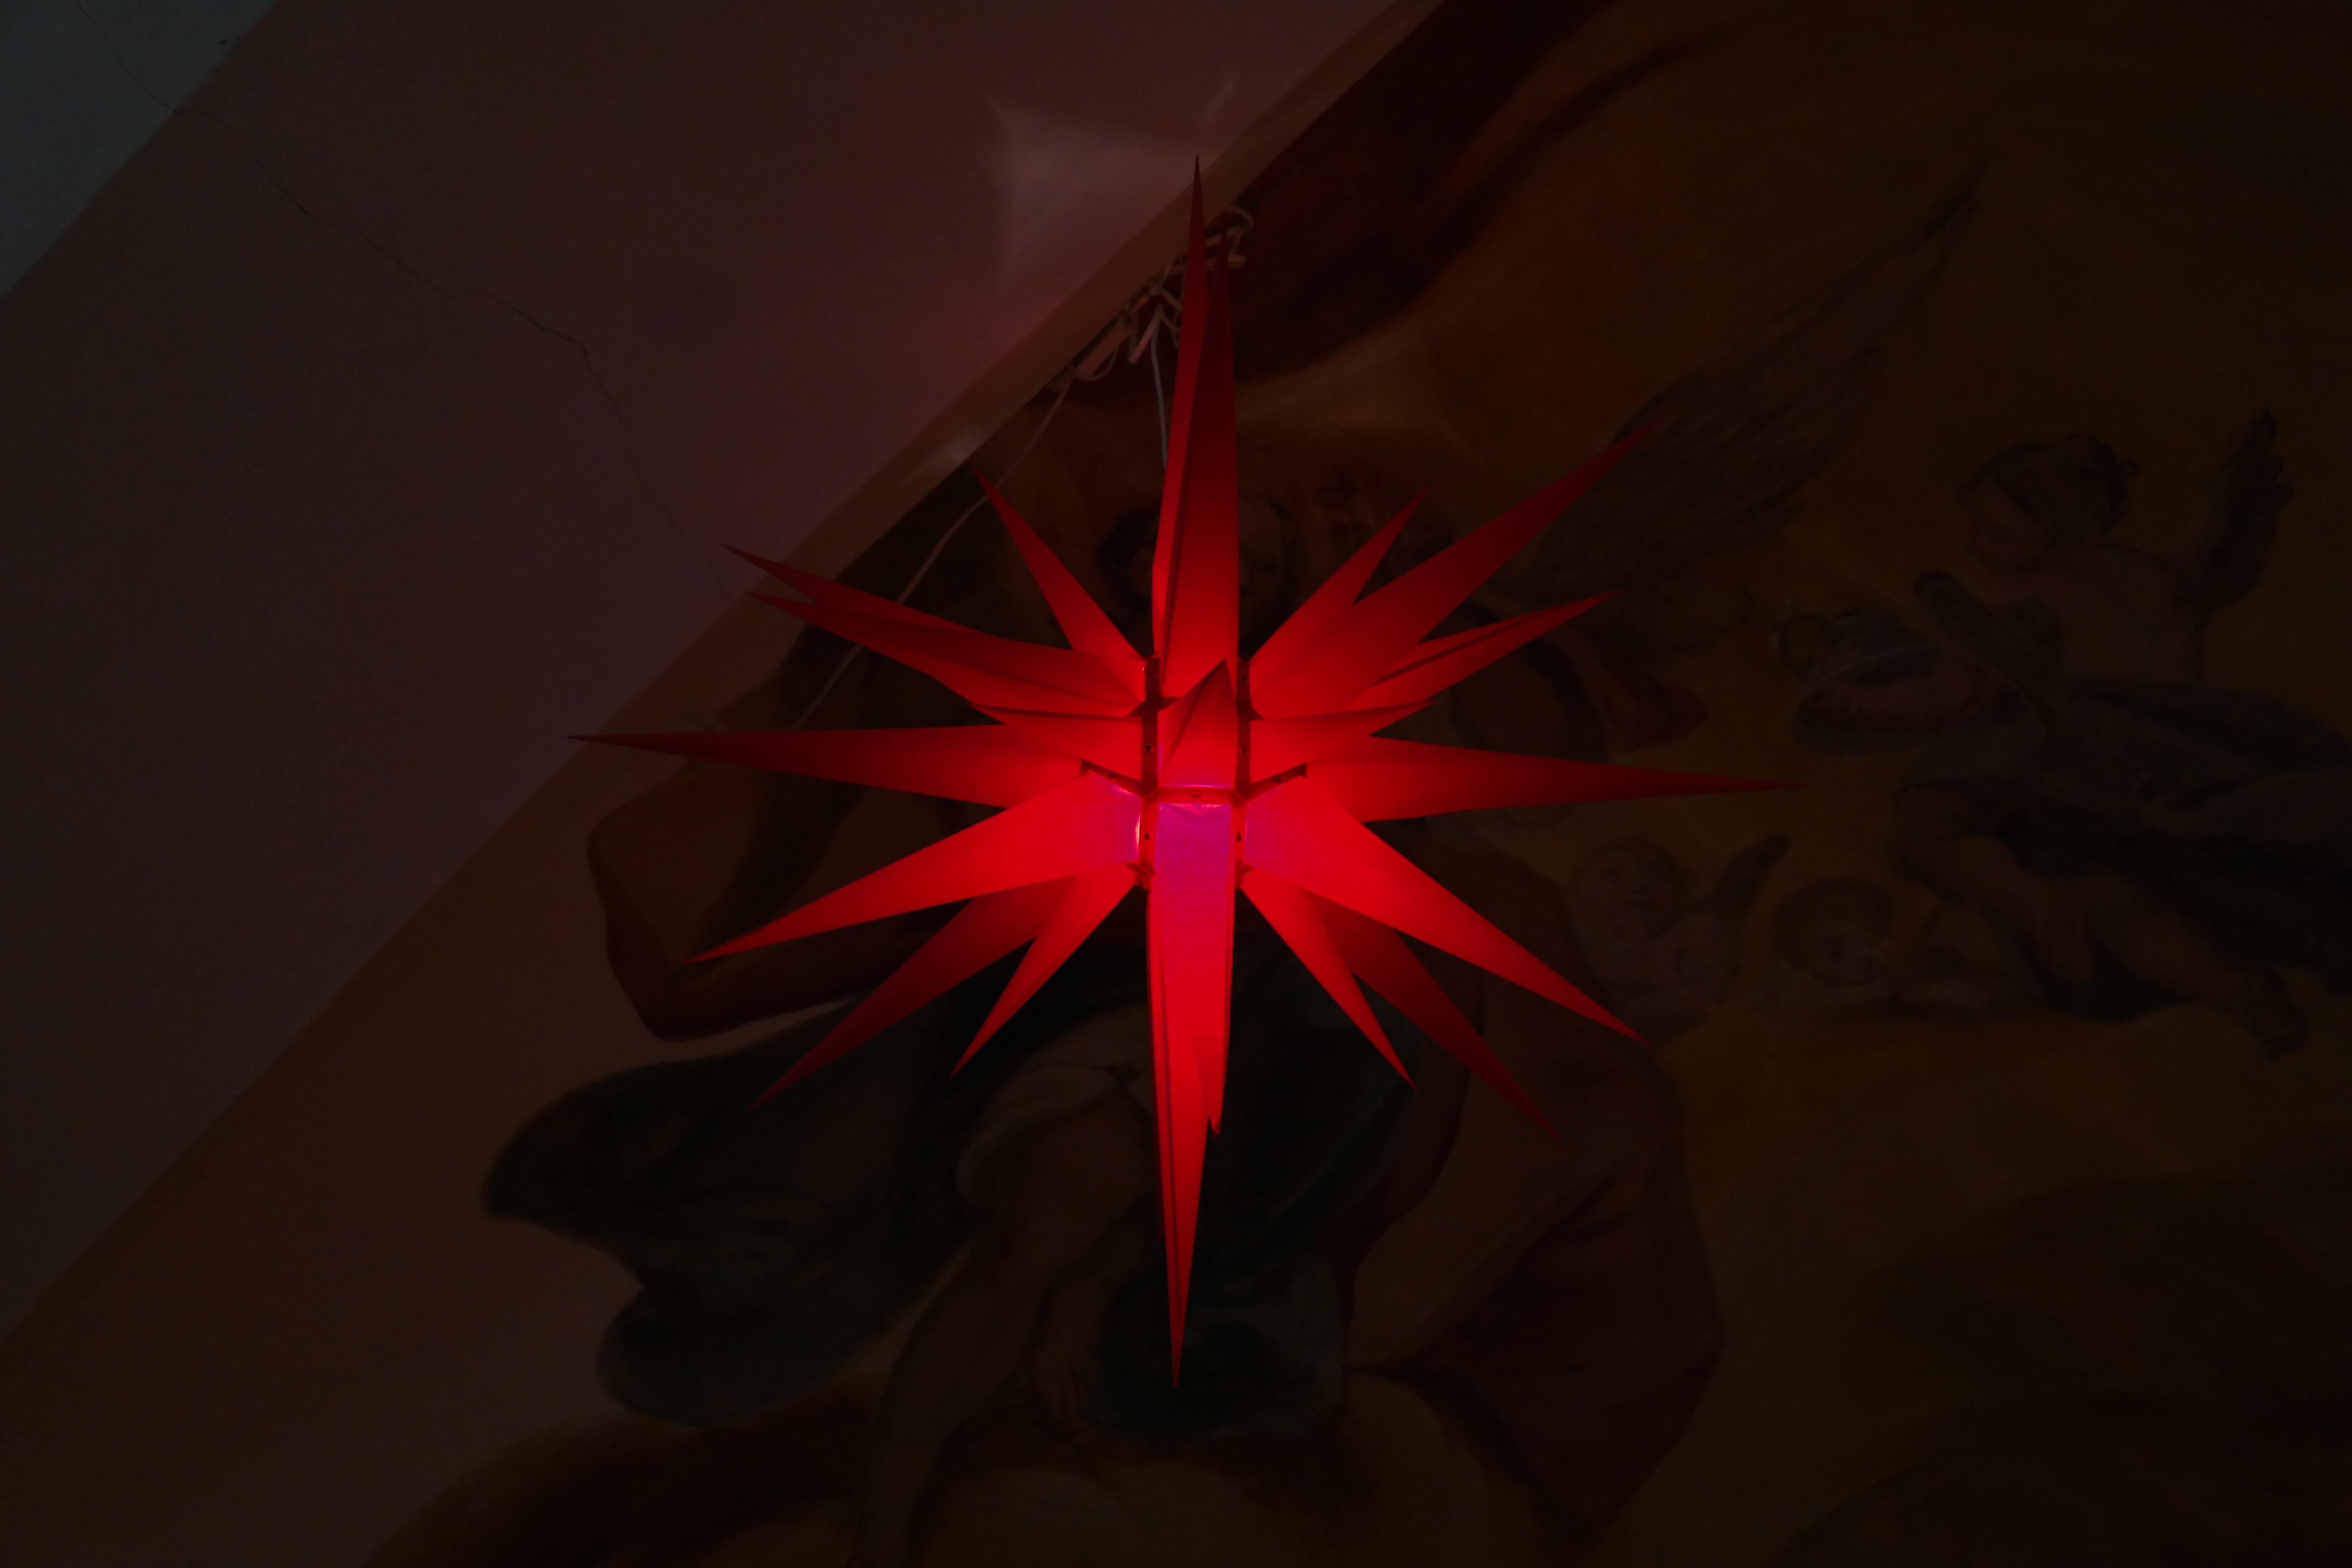 light star flower geometric red symbol color darkness christmas lighting circle art symmetry poinsettia shape screenshot